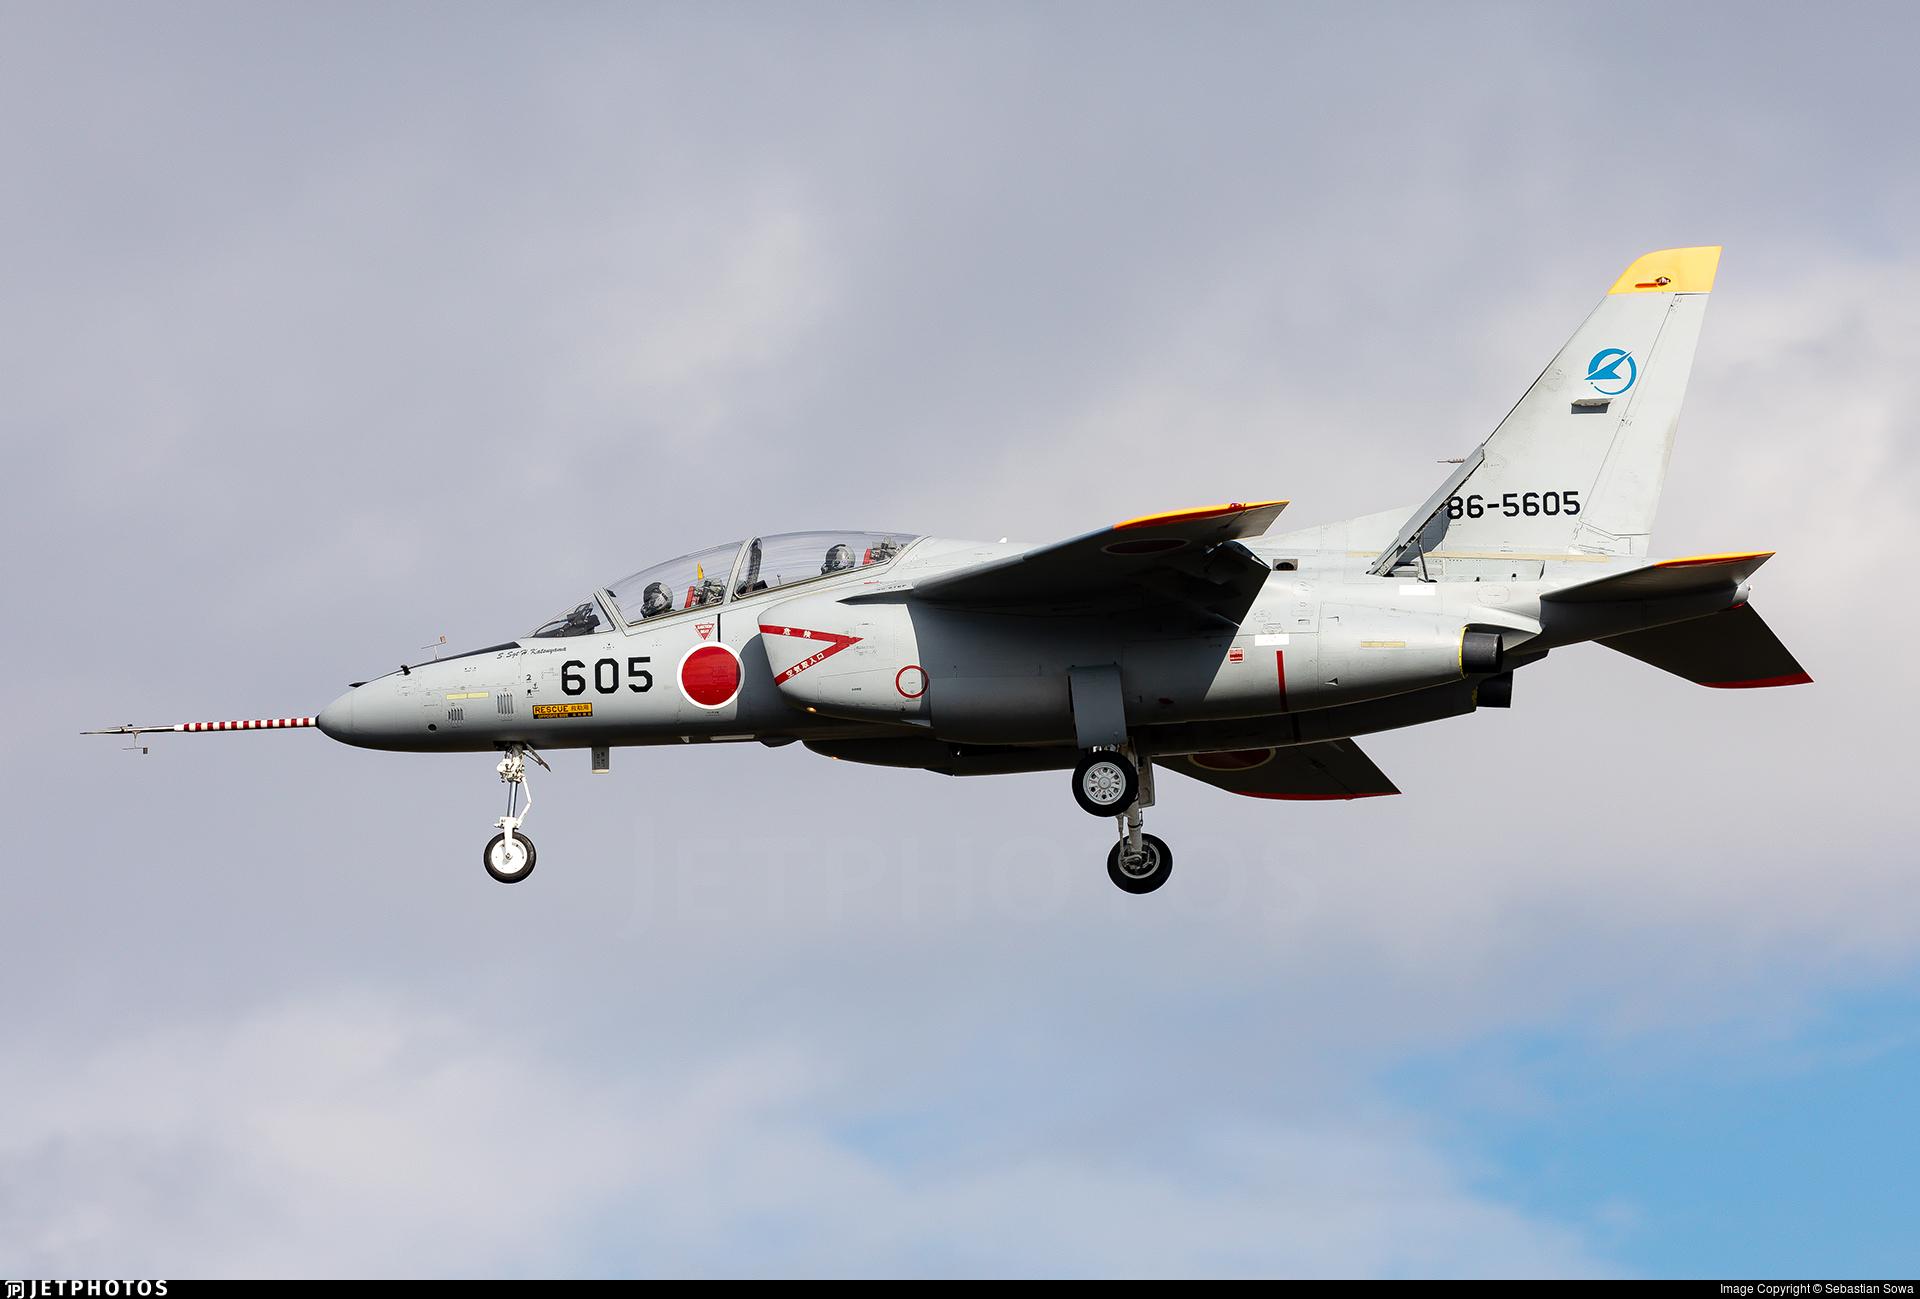 86-5605 - Kawasaki T-4 - Japan - Air Self Defence Force (JASDF)